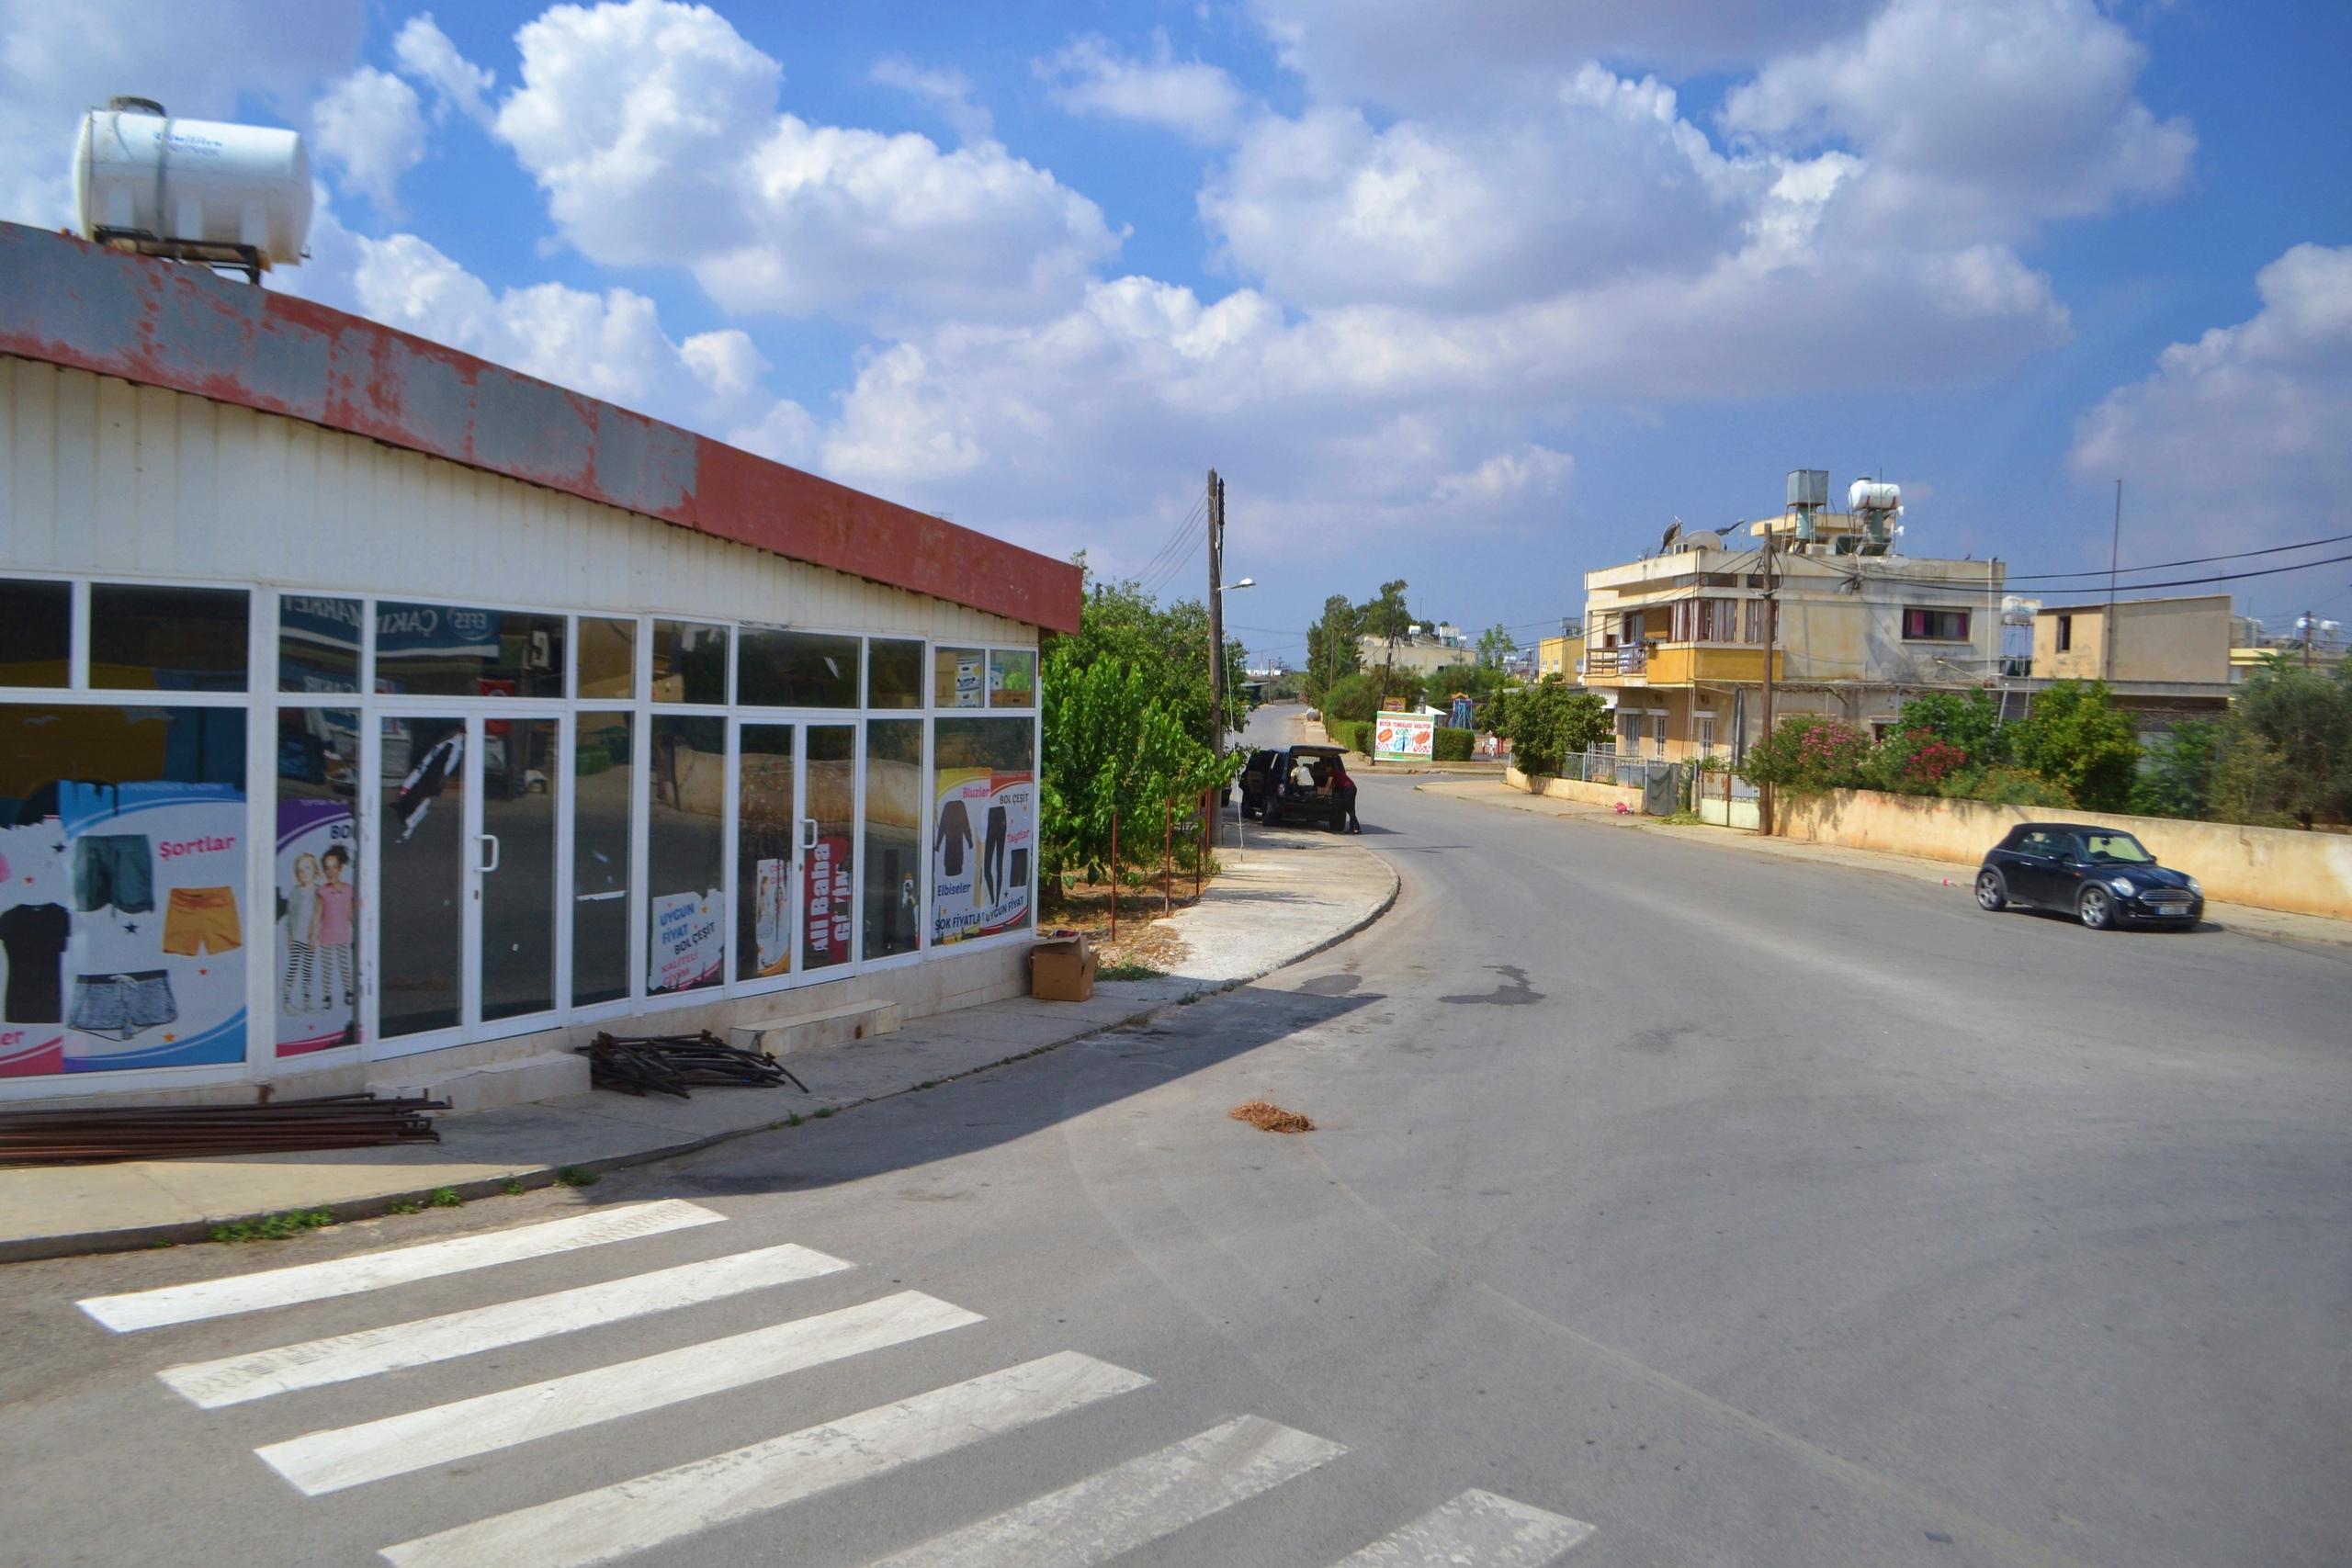 Елена Руденко (Валтея). Северный Кипр. Кериния и Фамагуста. (фото) - Страница 3 GKeM7iWgLN4